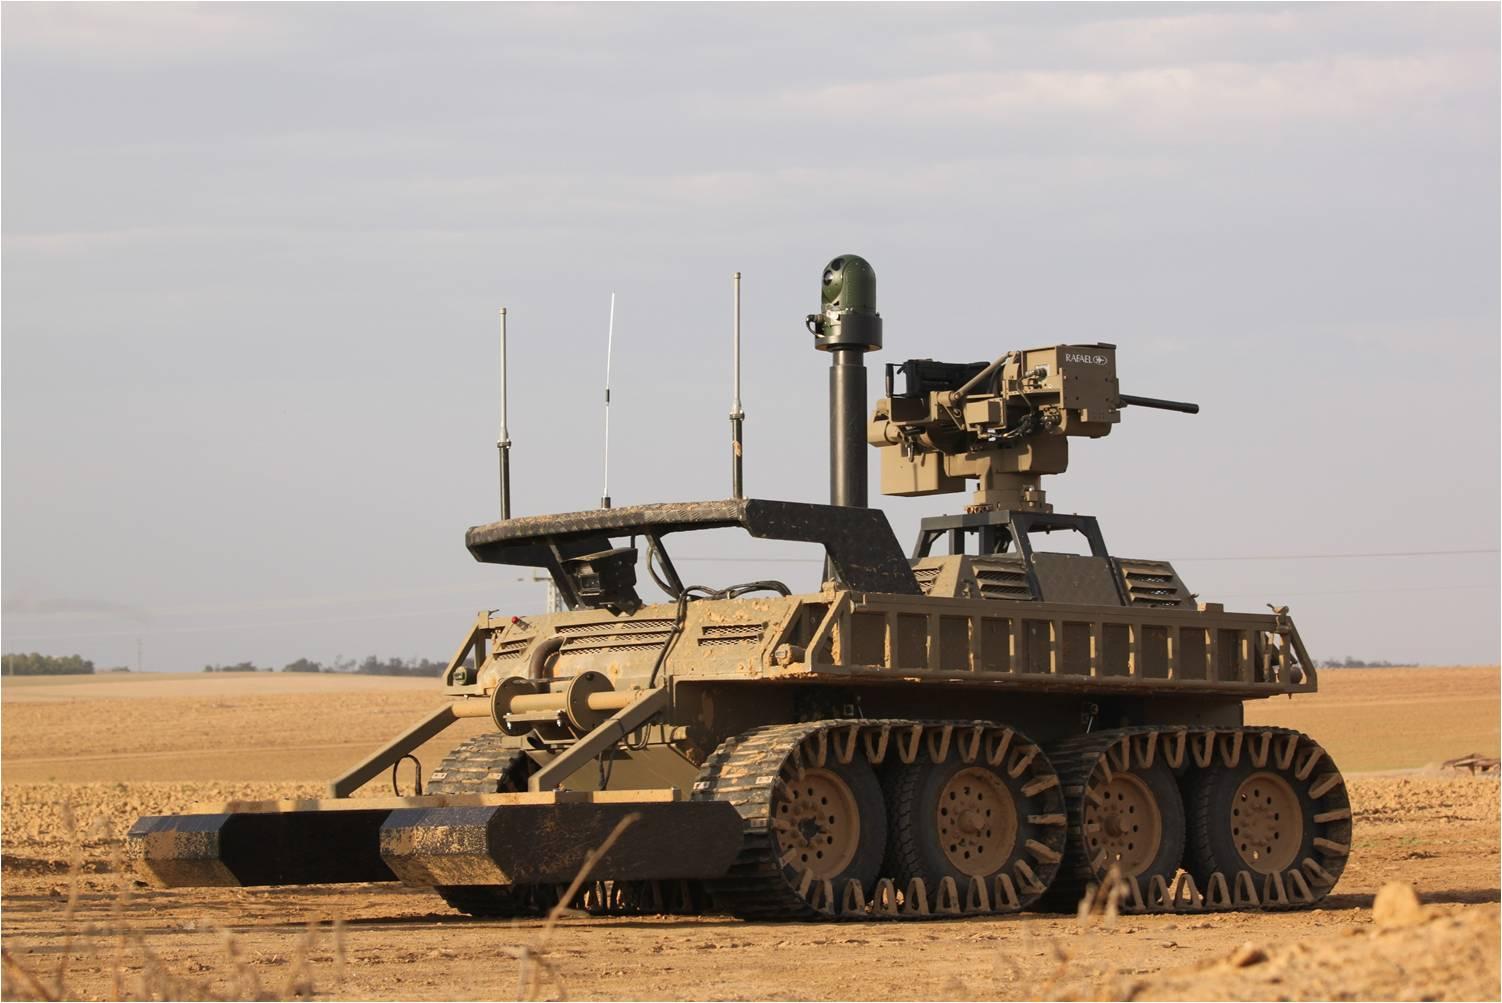 Unmanned Ground Vehicle Ugv Or Spycar